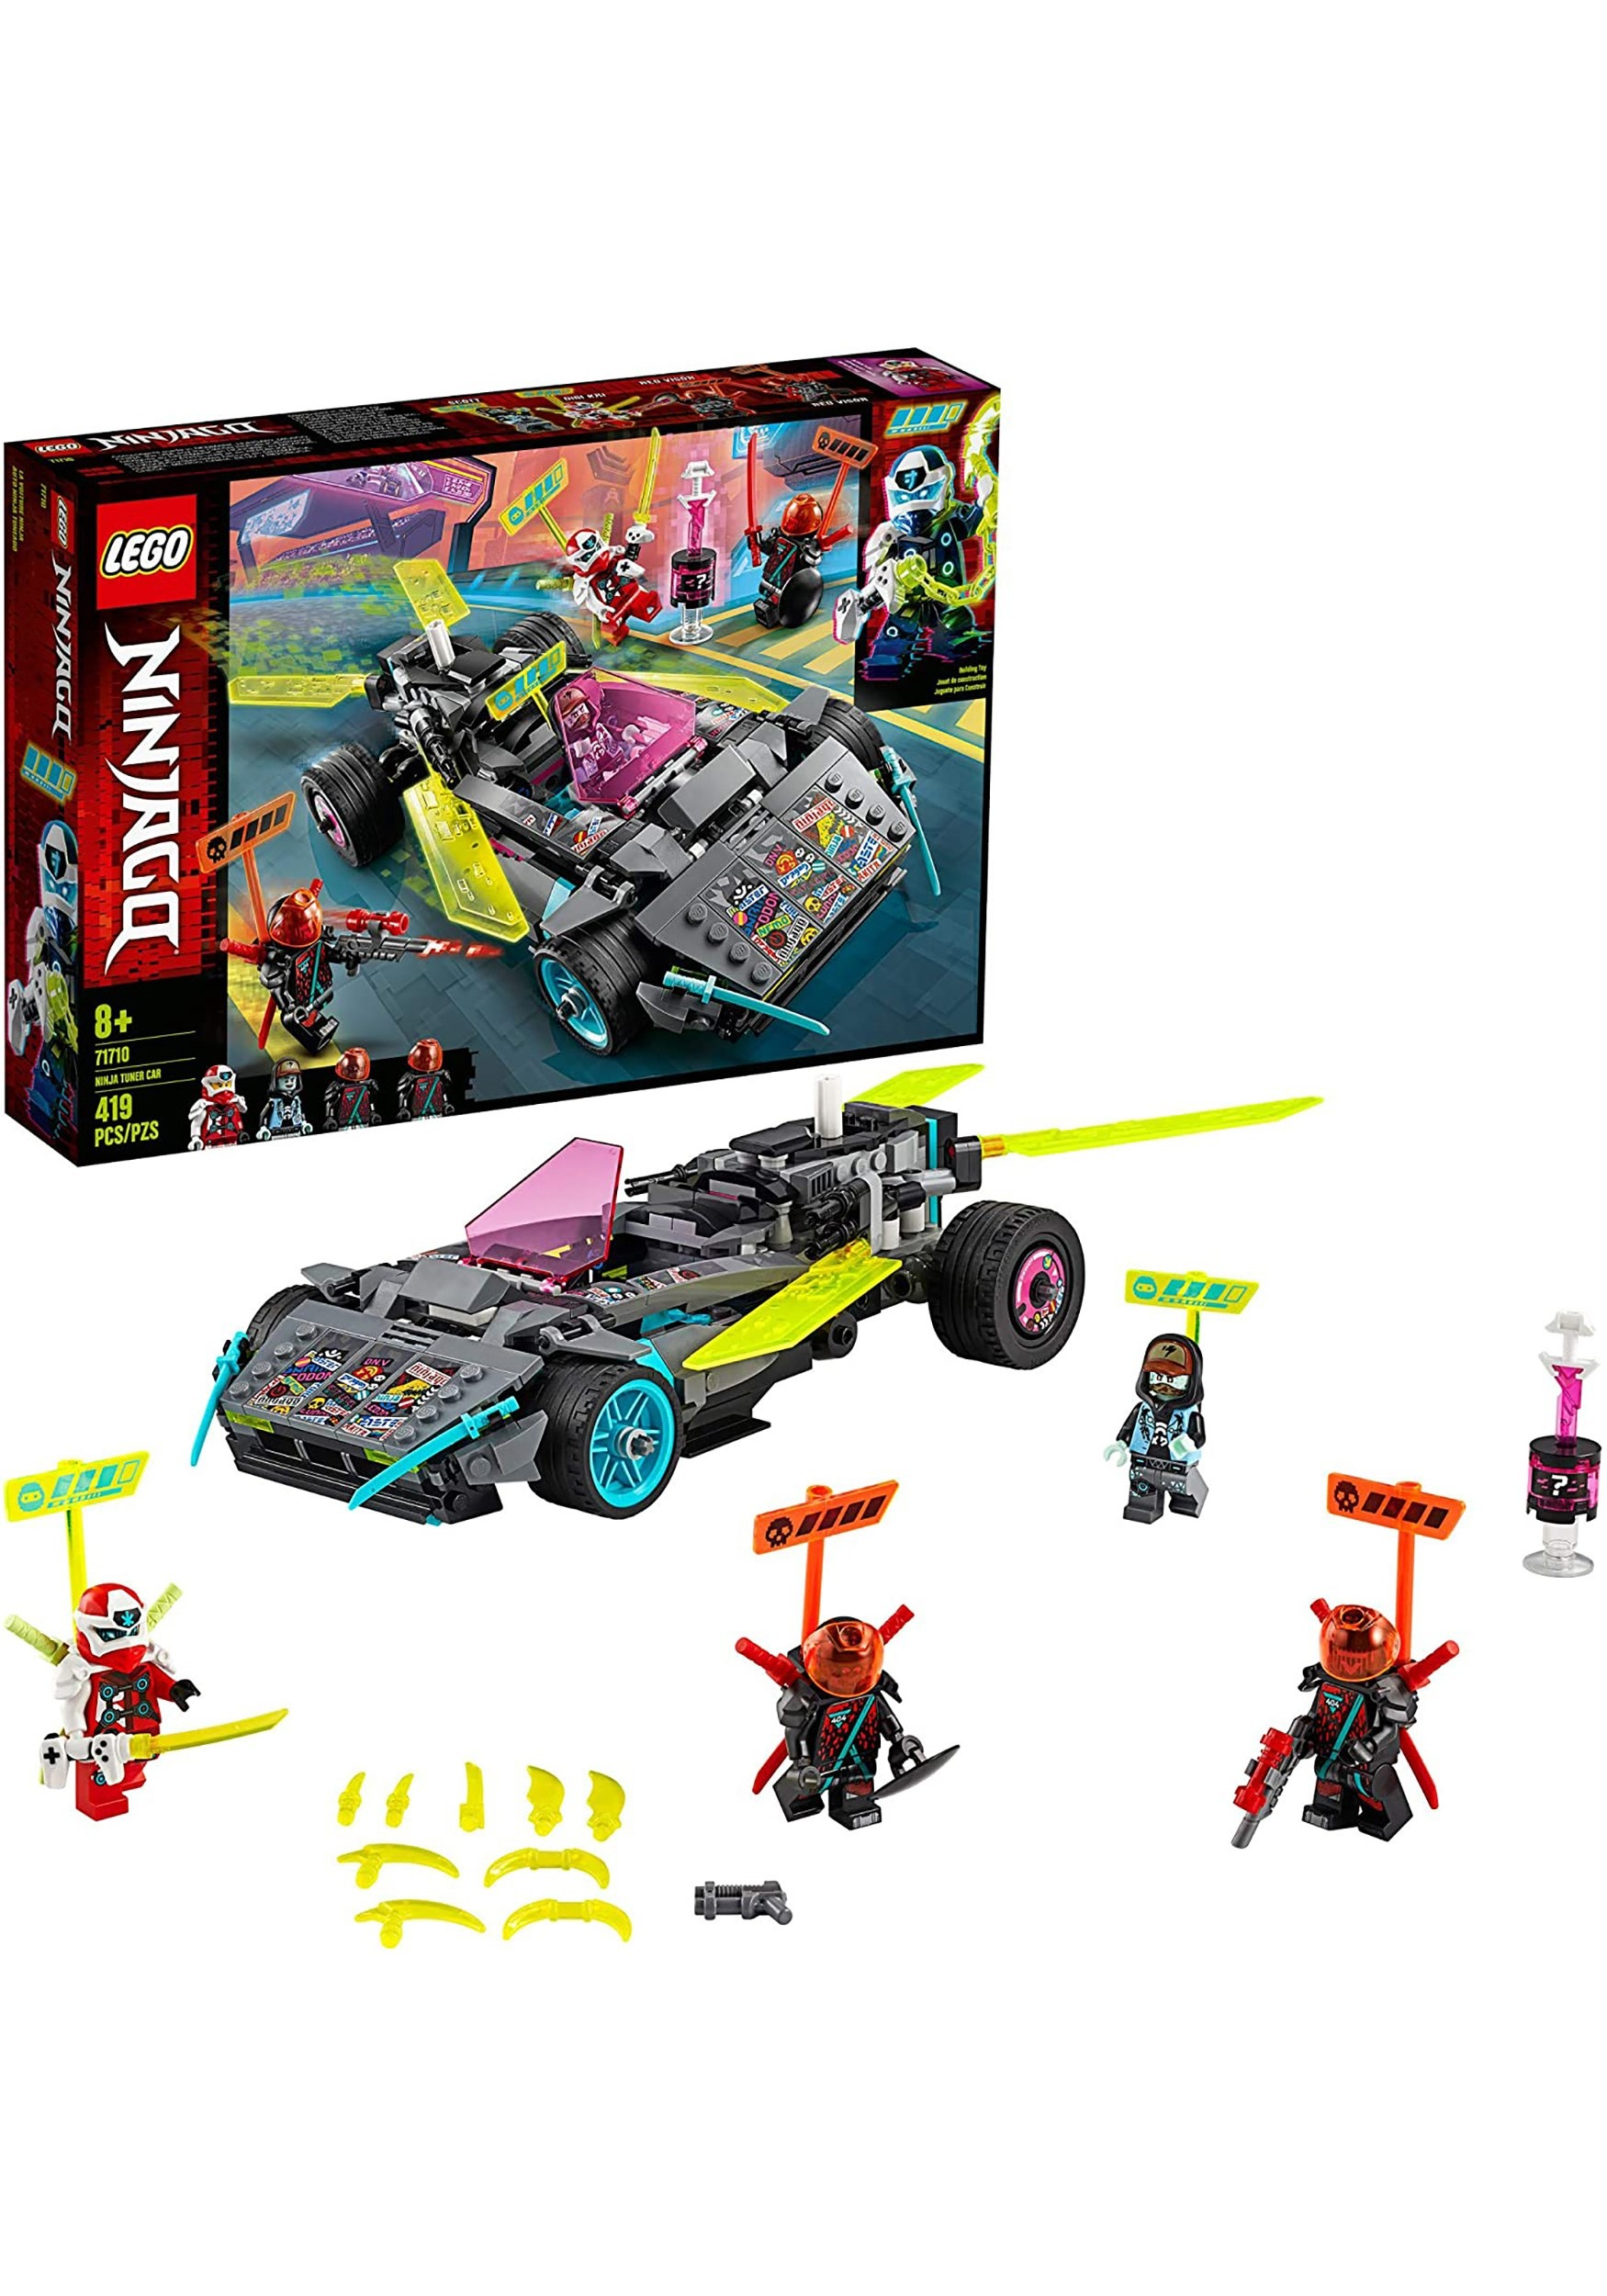 Ninjago Ninja Tuner Car LEGO Building Set